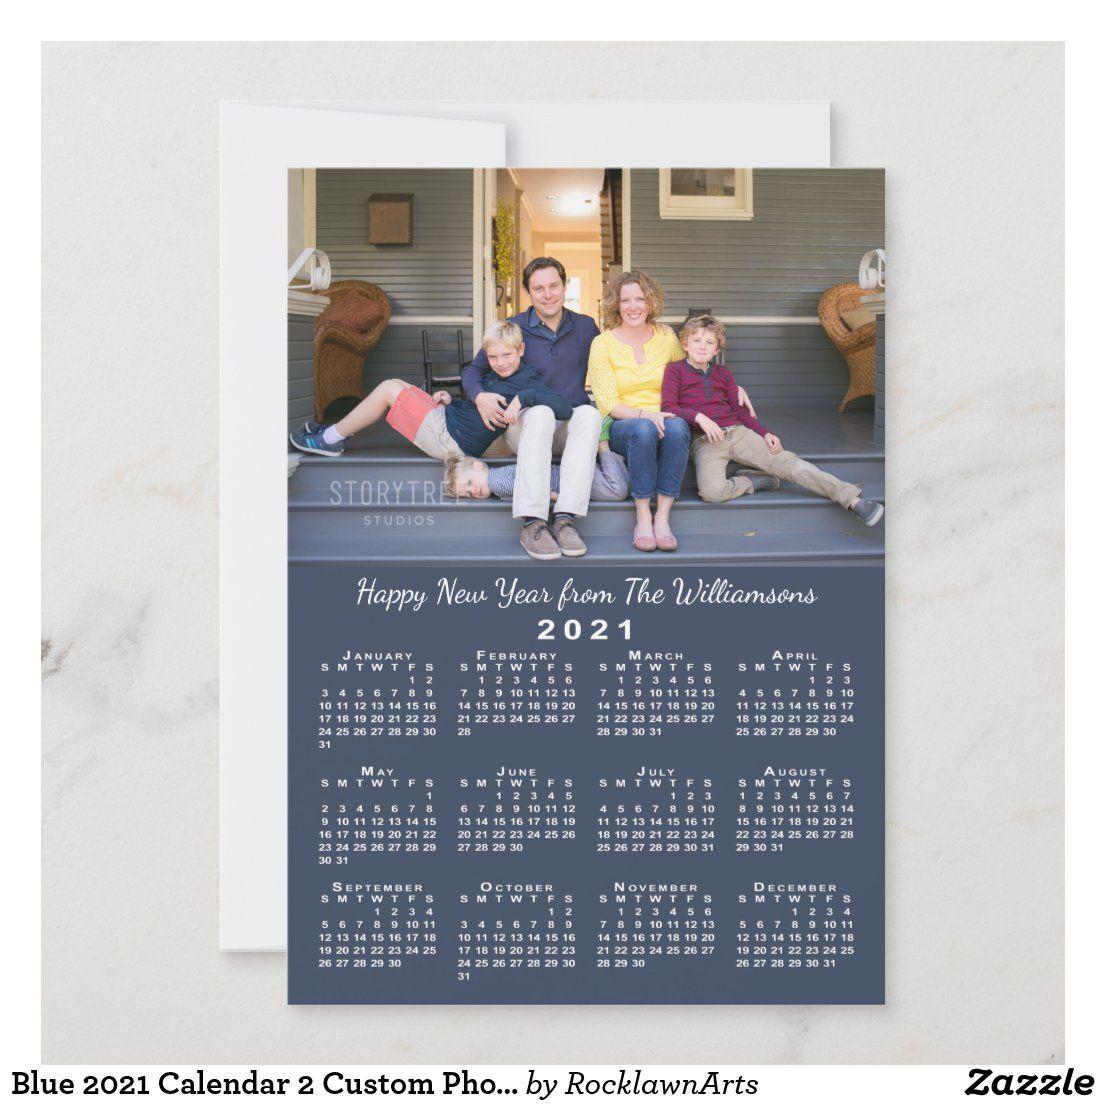 Blue 2021 Calendar 2 Custom Photos Happy New Year Holiday